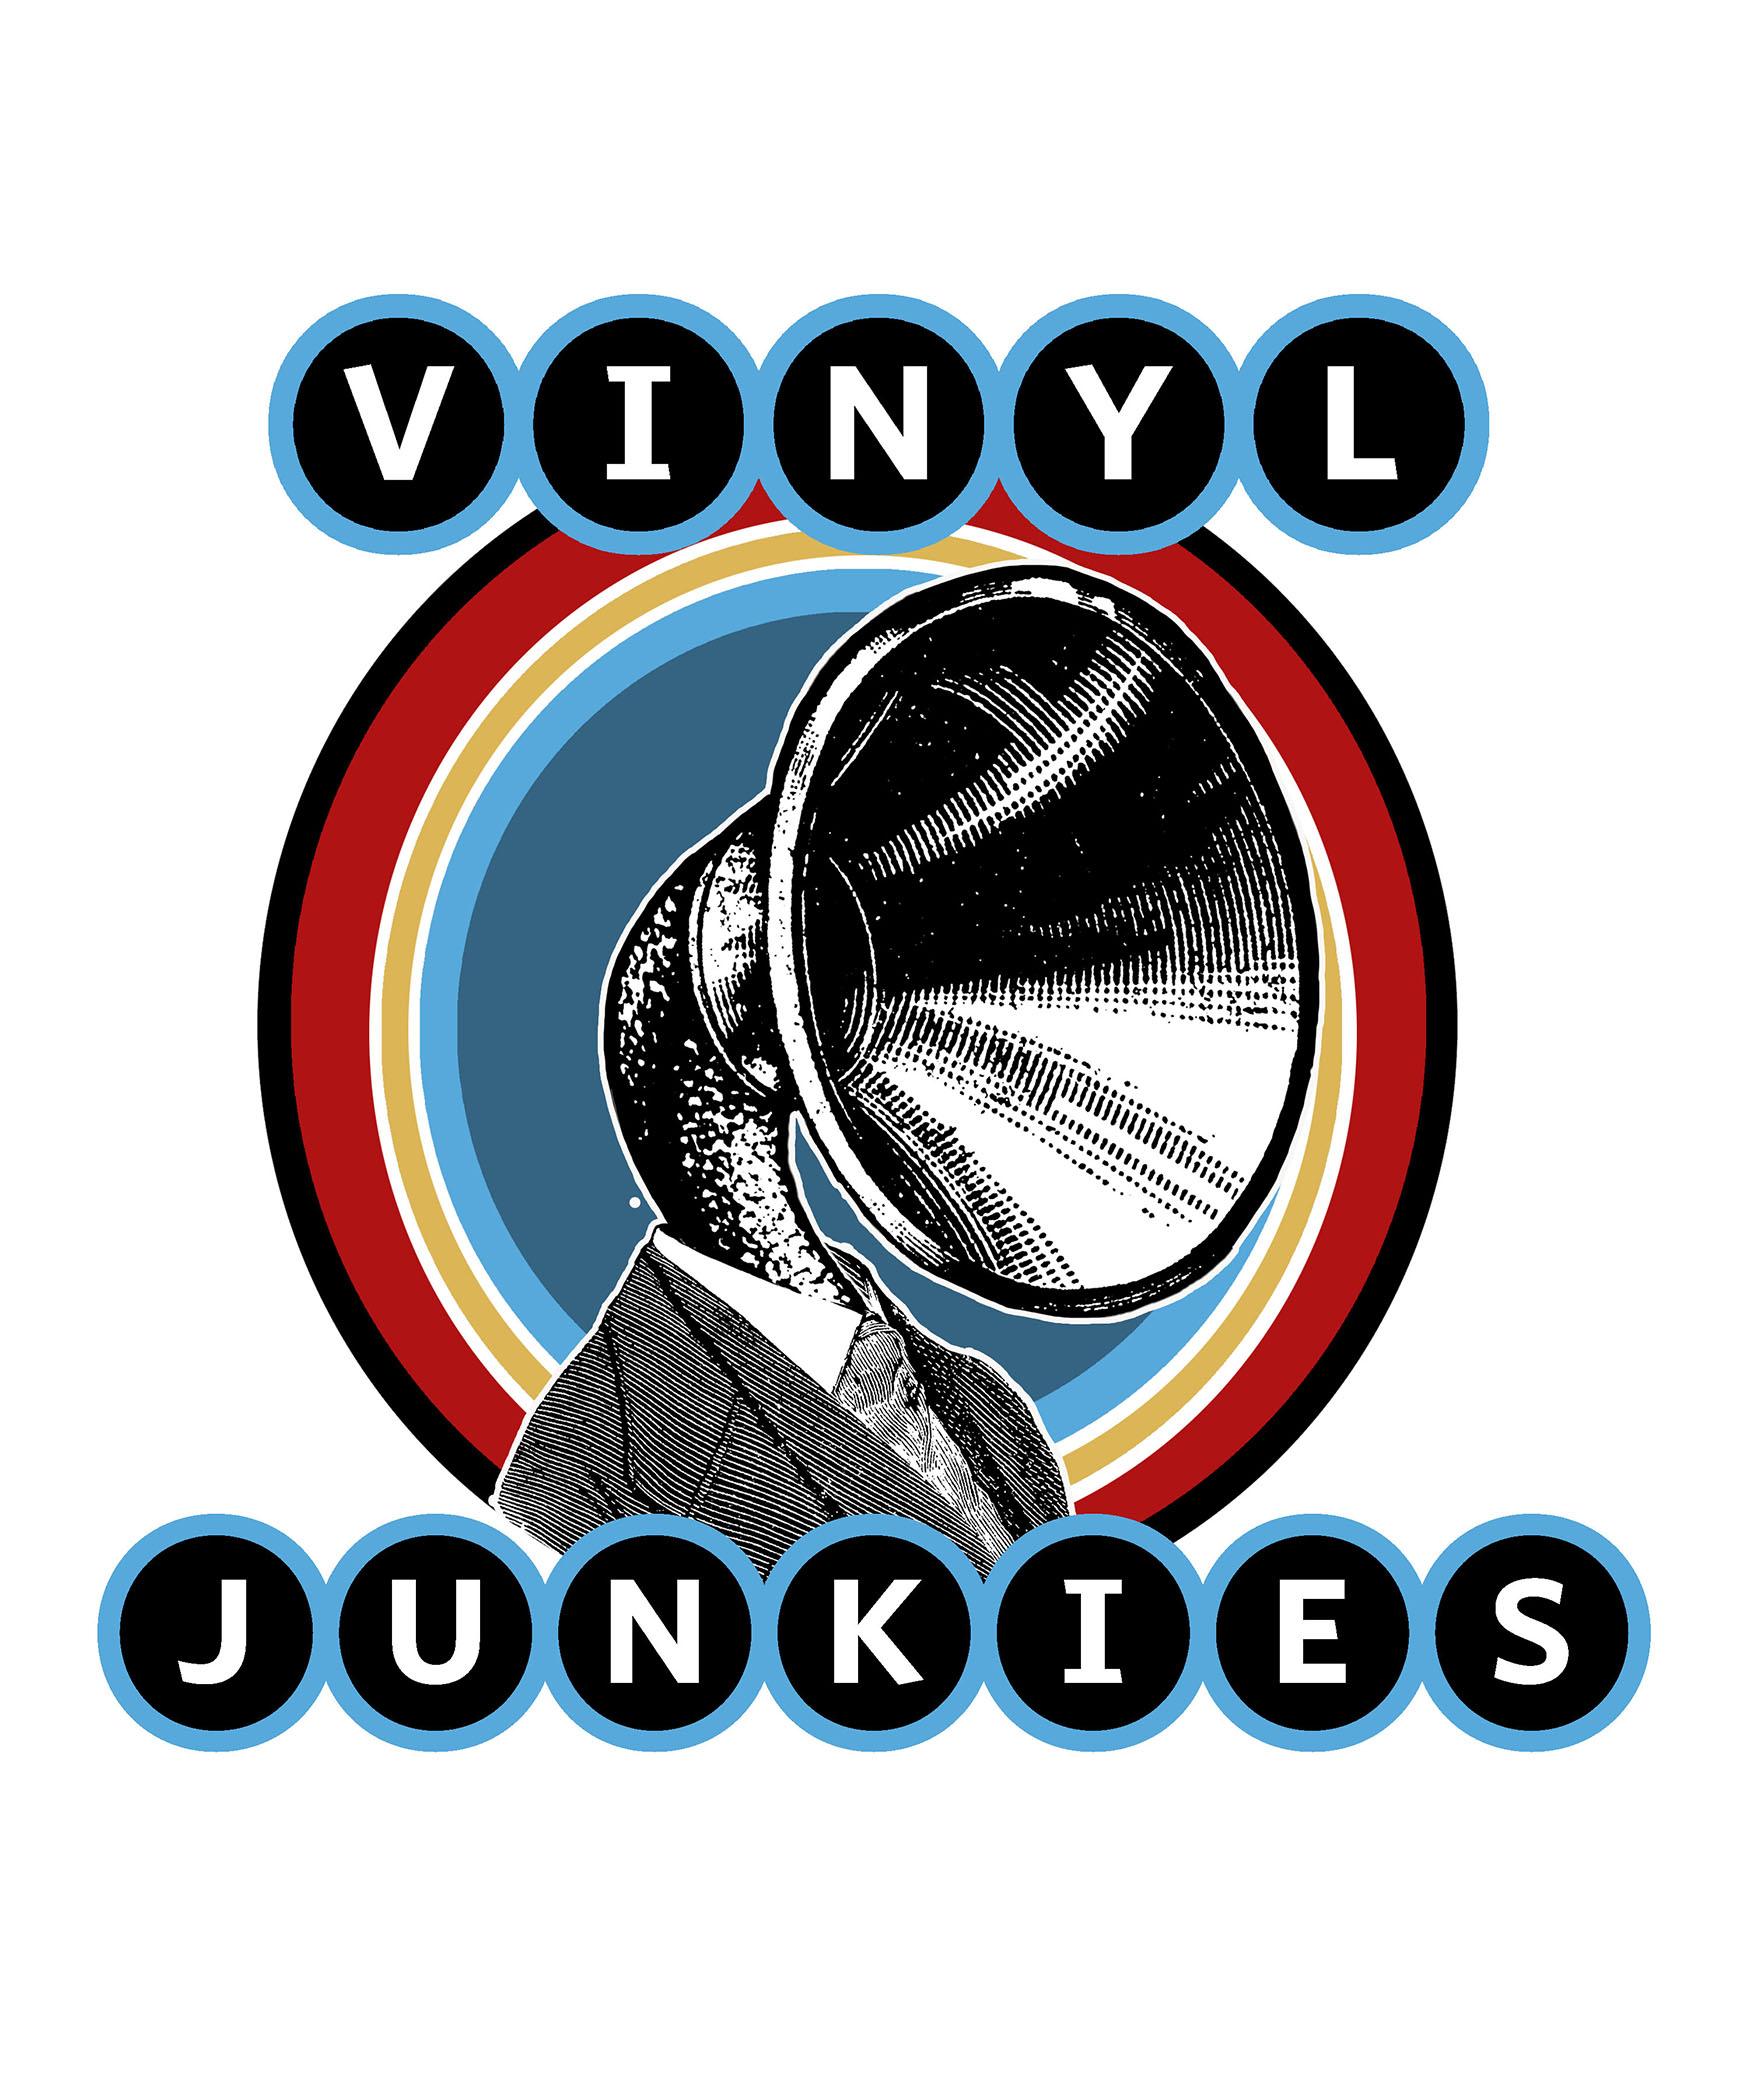 VJ Pirate Radio (All Vinyl) show art